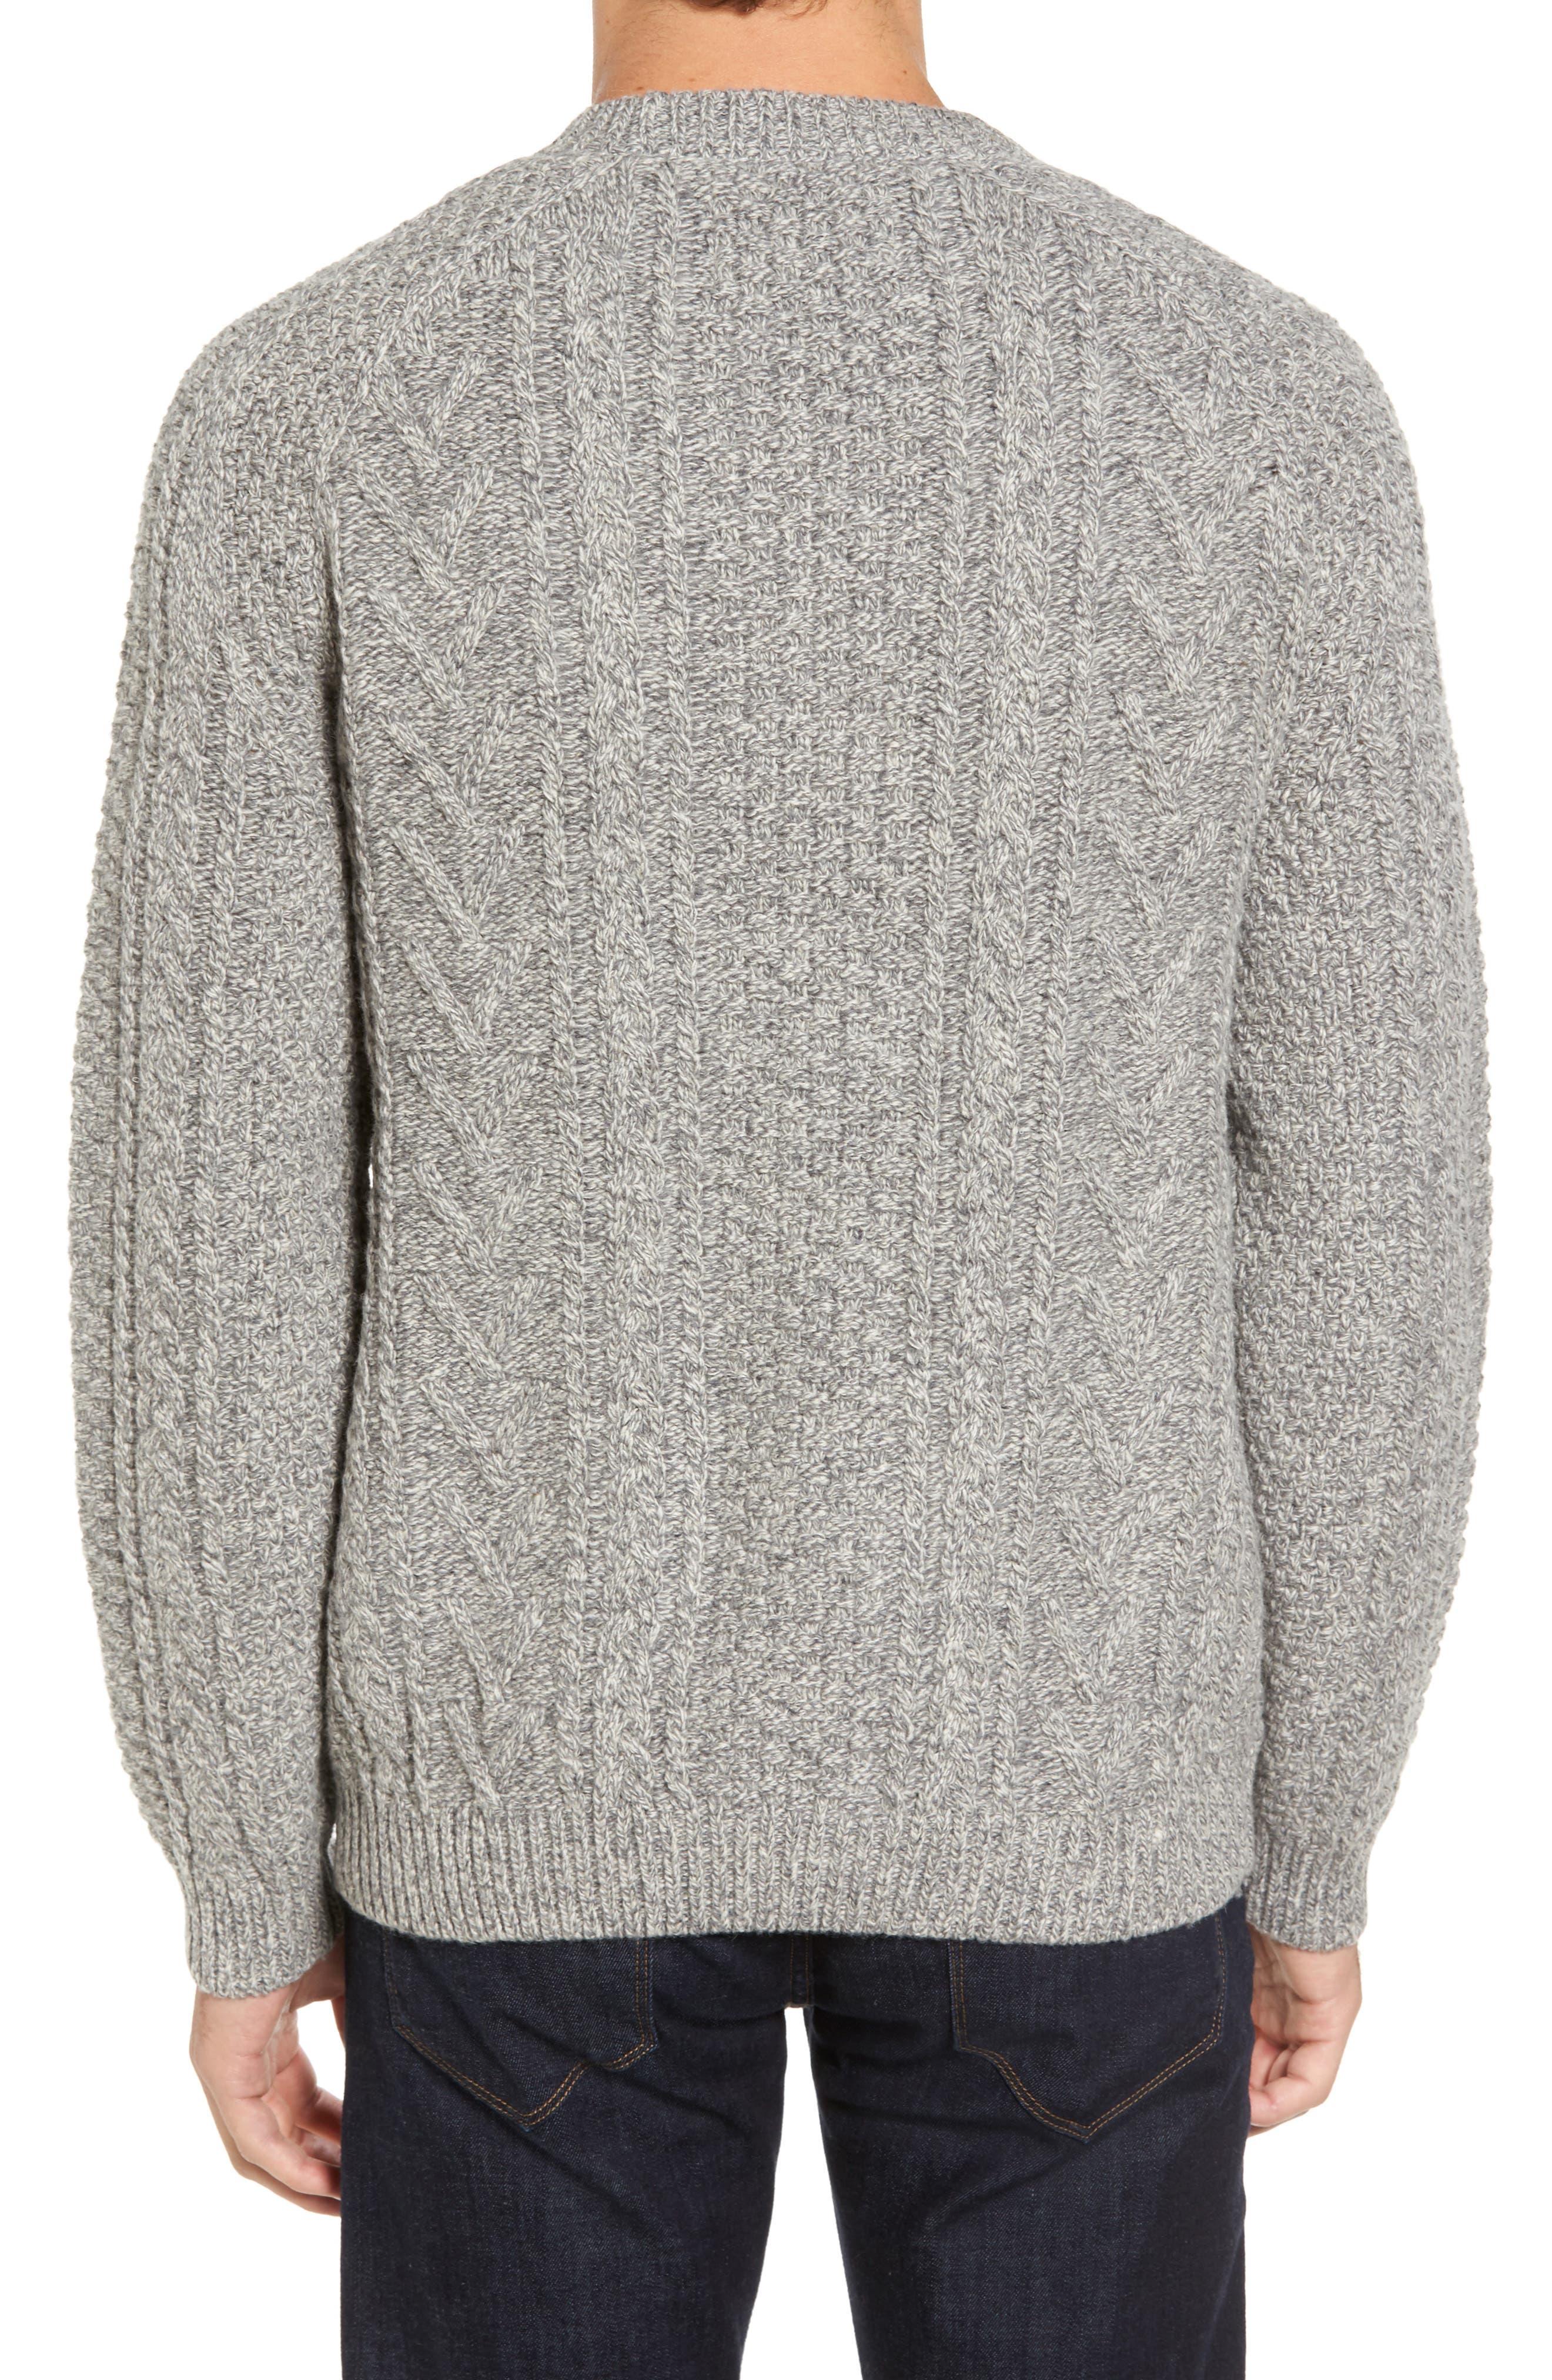 Fisherman Knit Wool Blend Sweater,                             Alternate thumbnail 3, color,